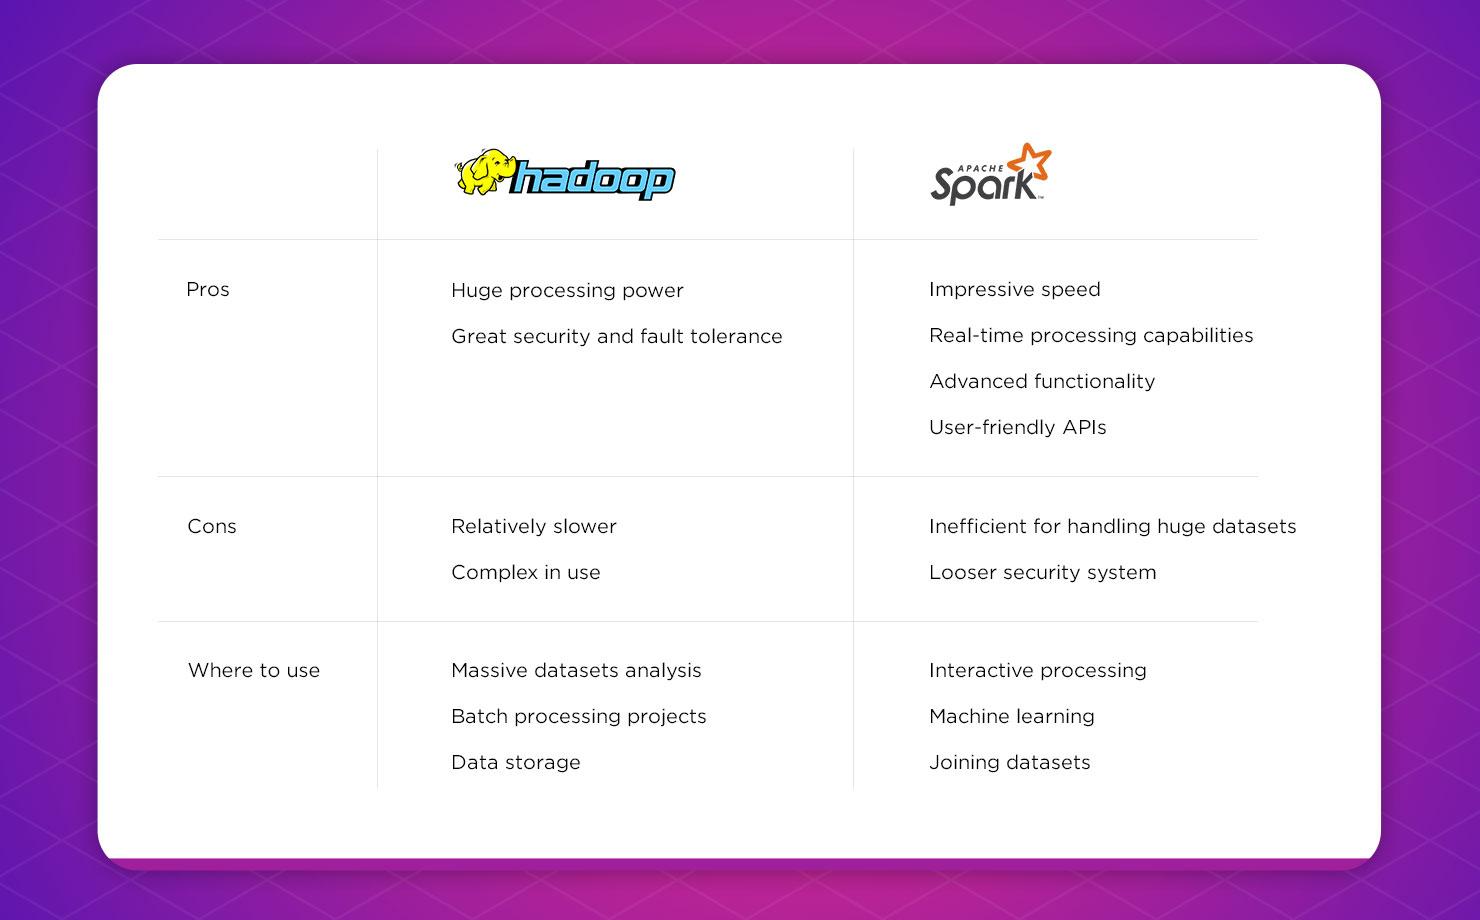 hadoop vs spark comparison chart